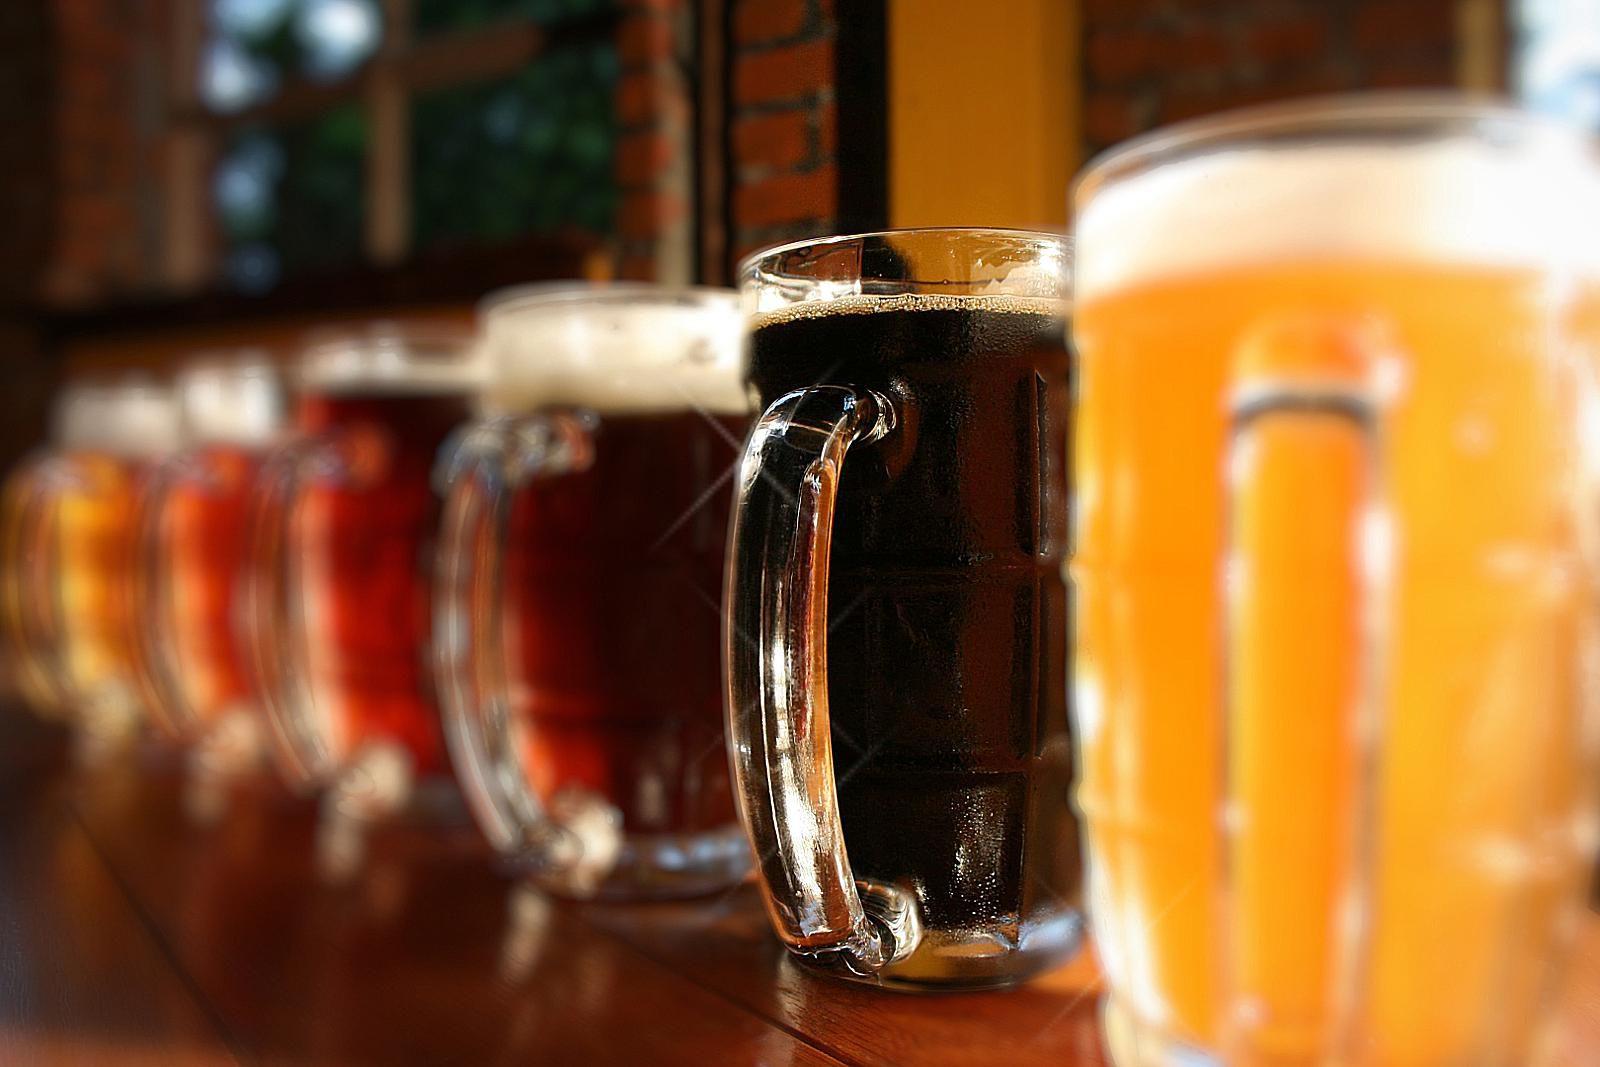 Beer at Montreal Beer Festival